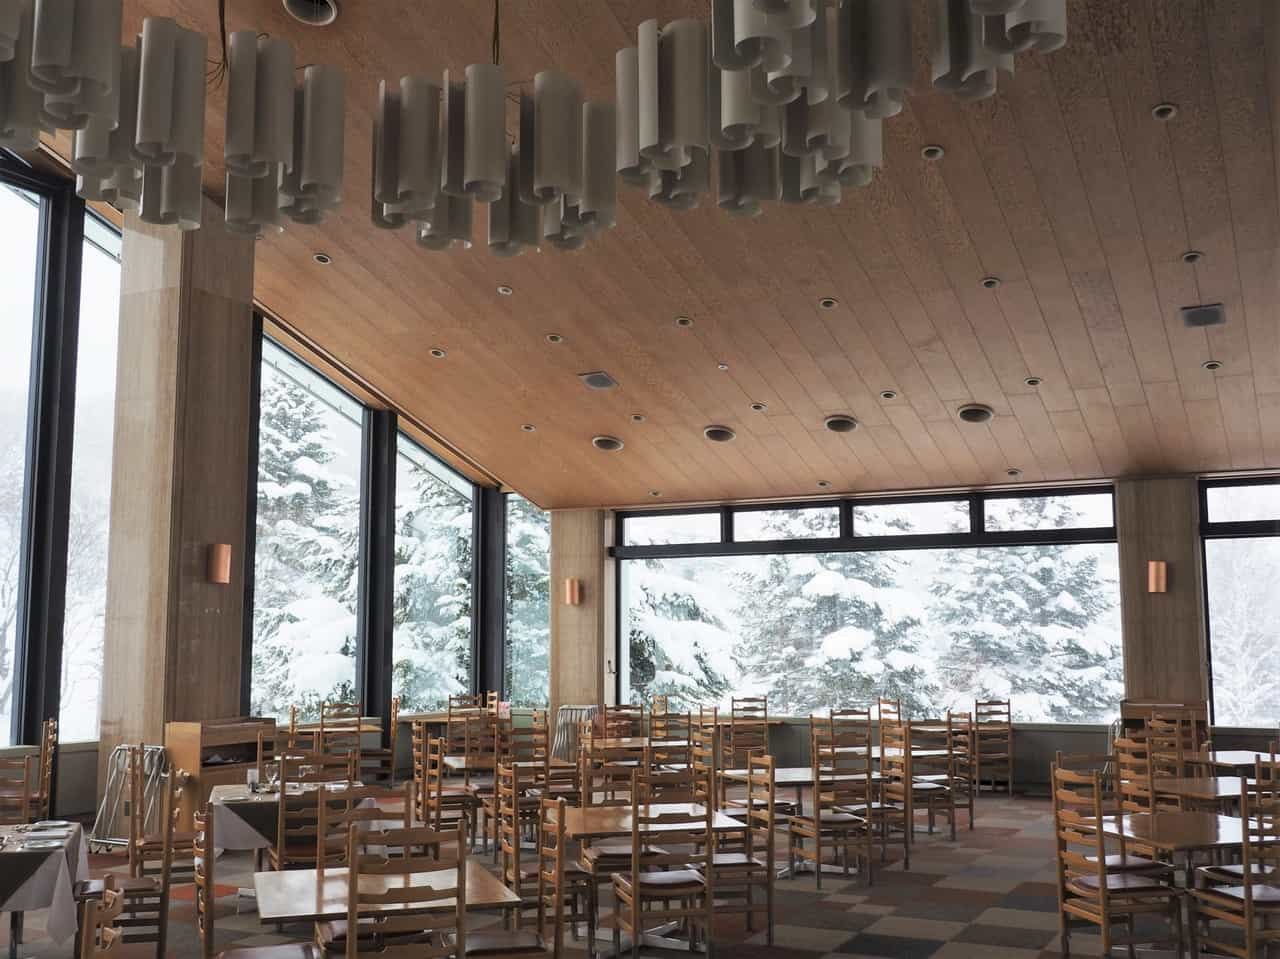 Le Shiga Kogen Prince Hotel East Wing au pied des pistes de ski